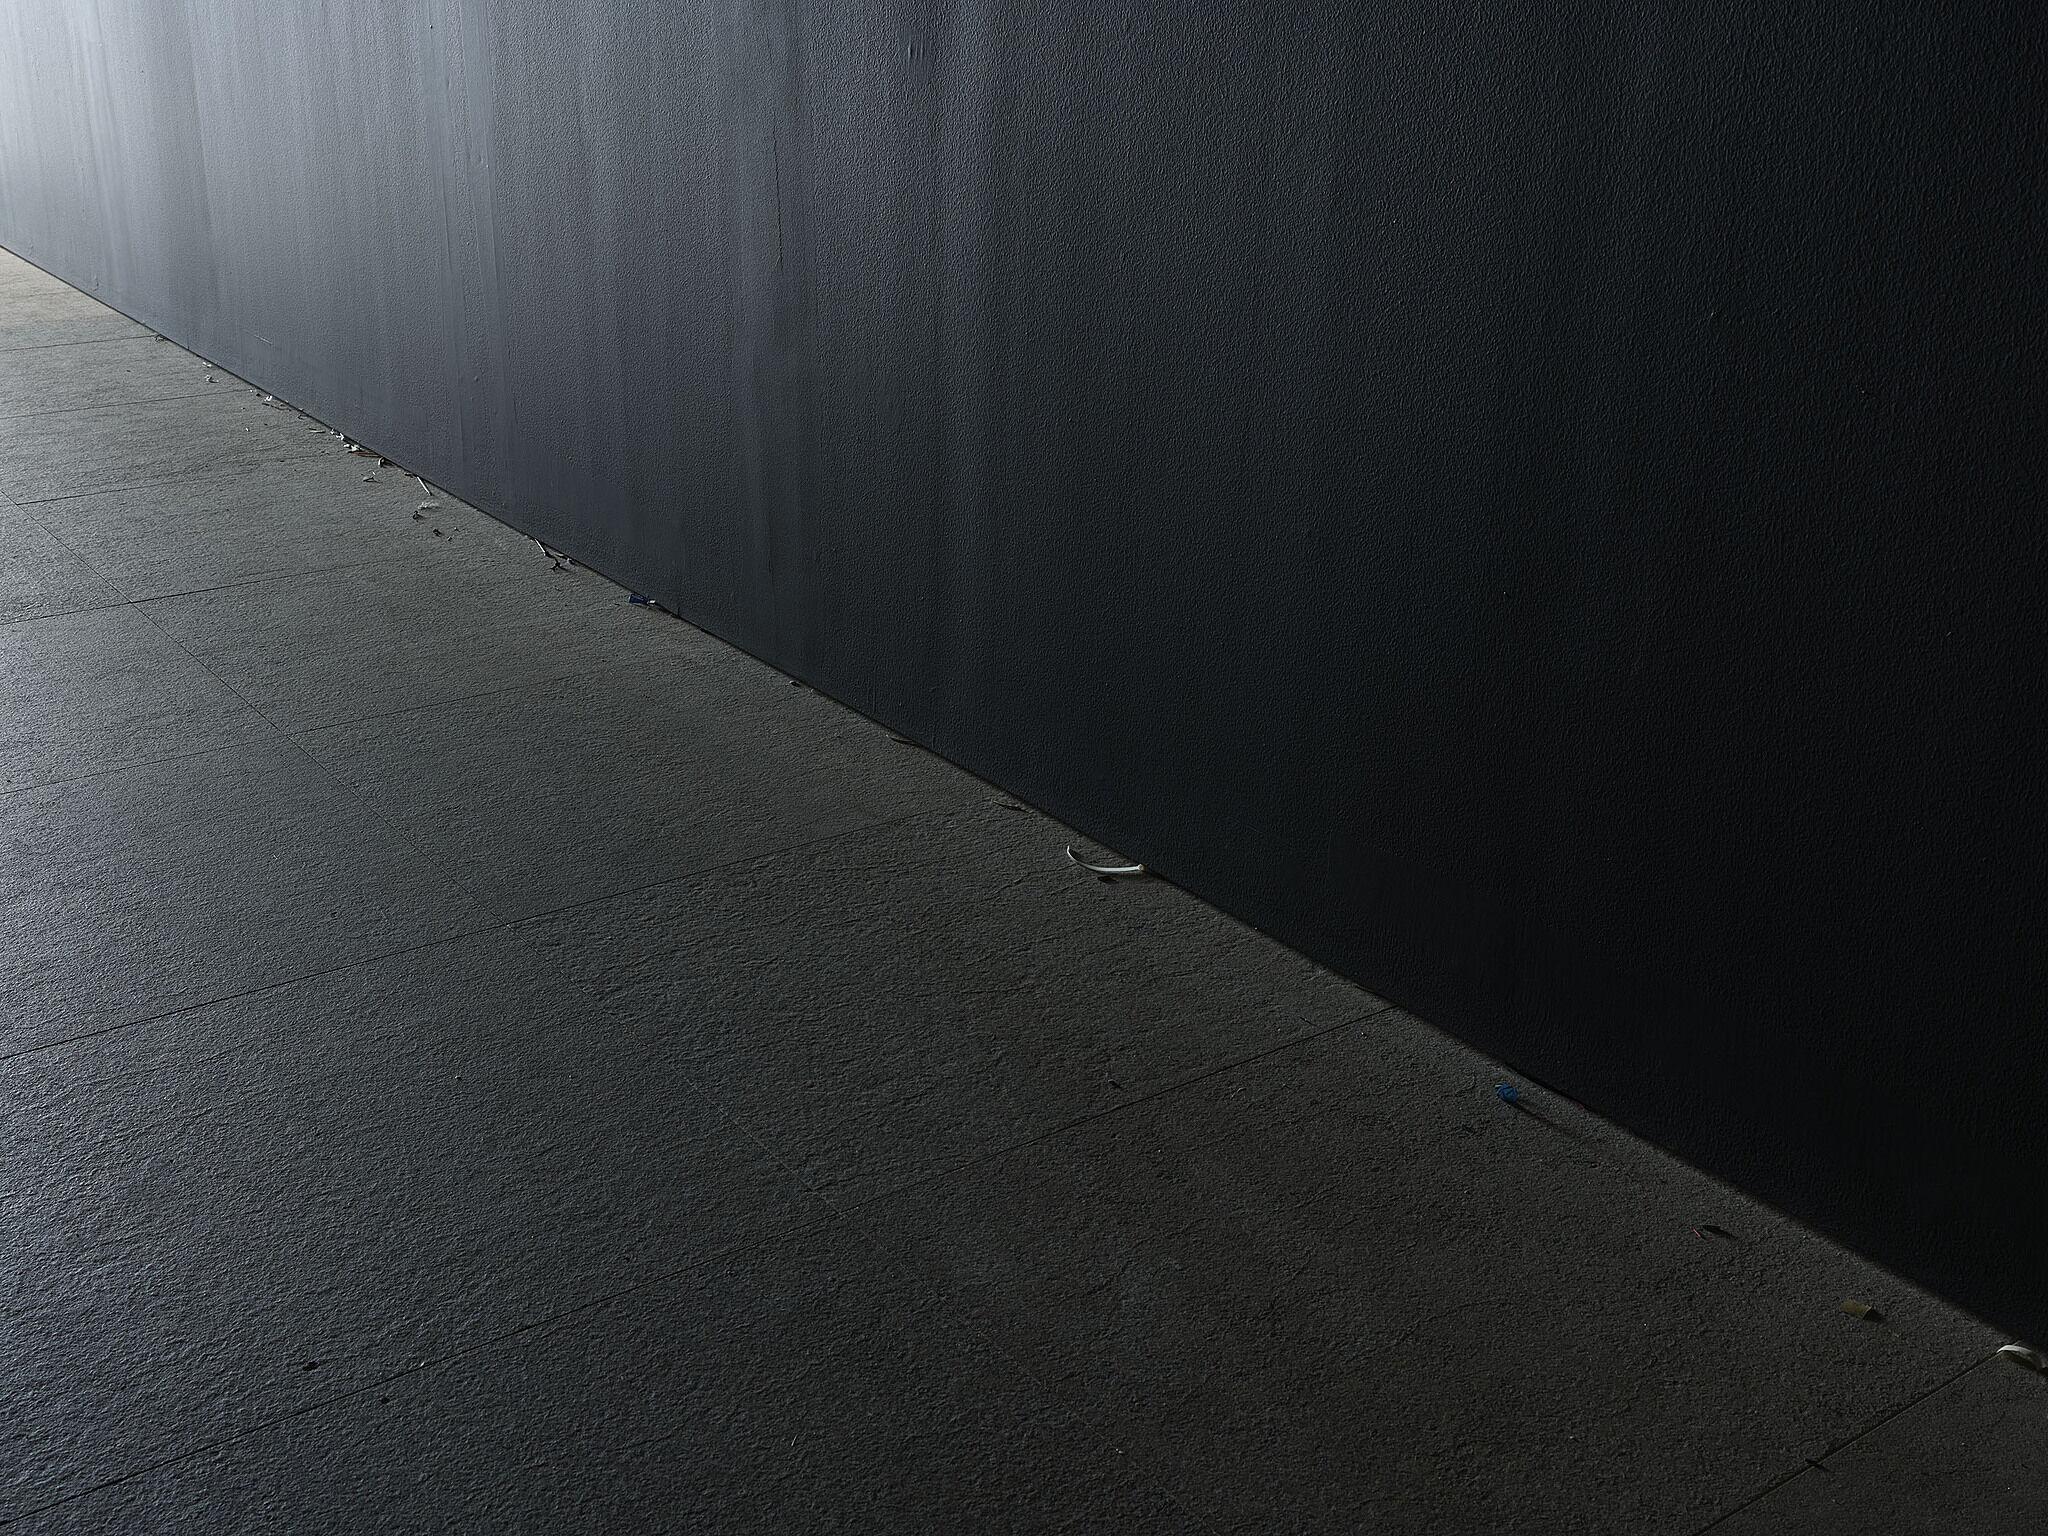 A dark hallway with visual debris.